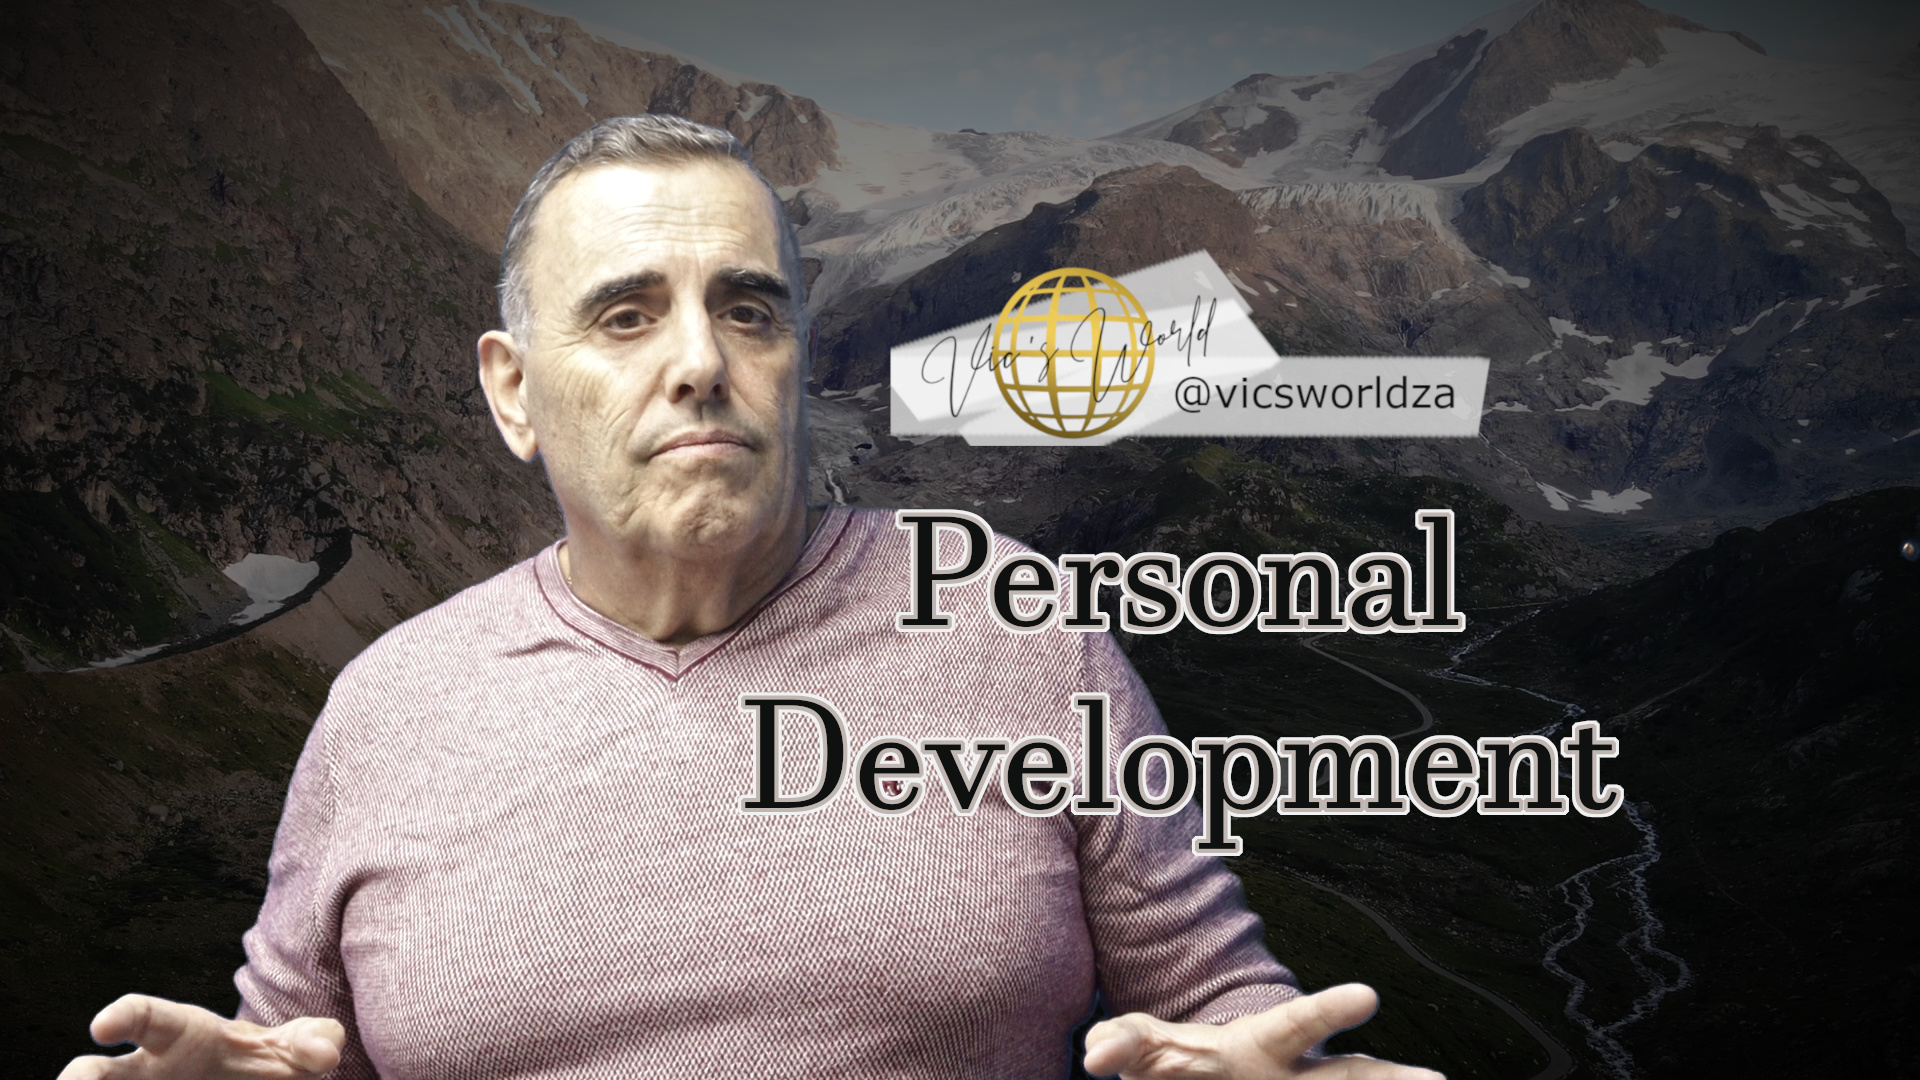 Personal development!